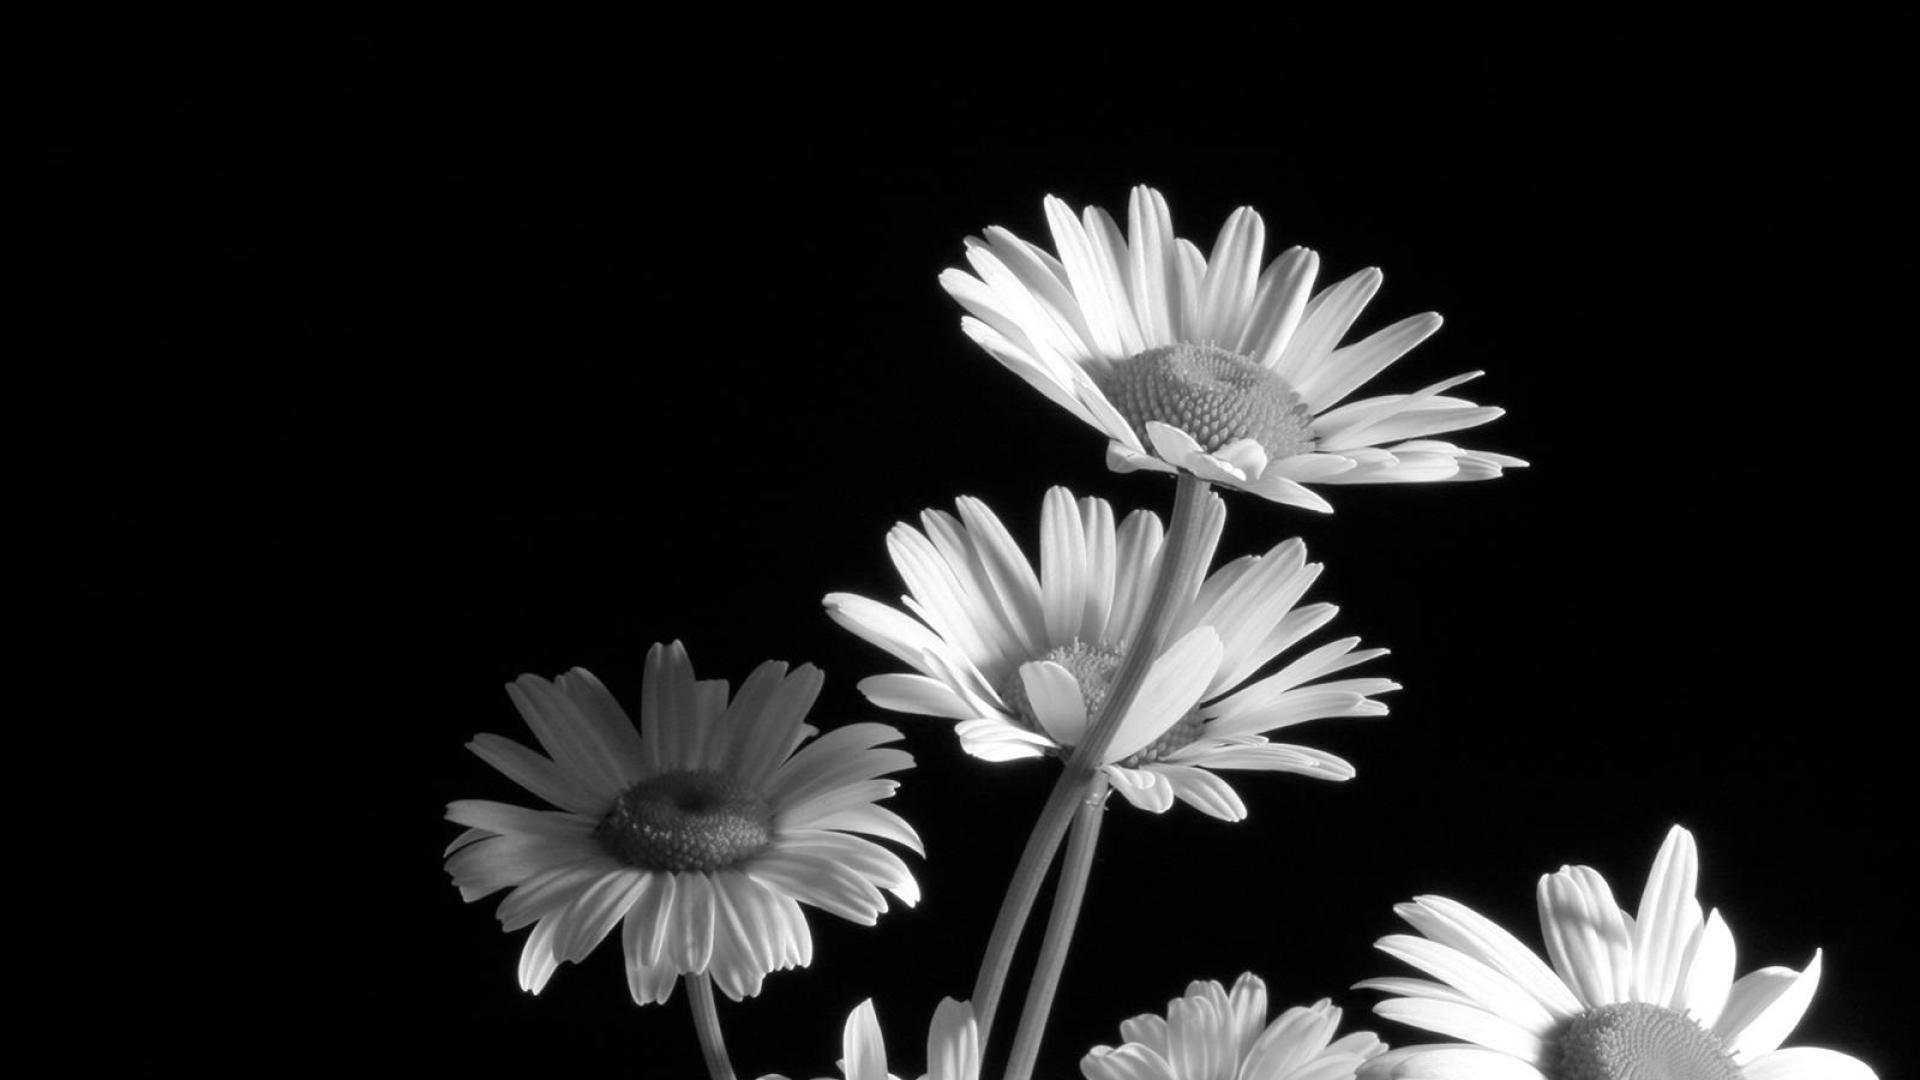 Black And White Flowers Wallpaper Sf Wallpaper